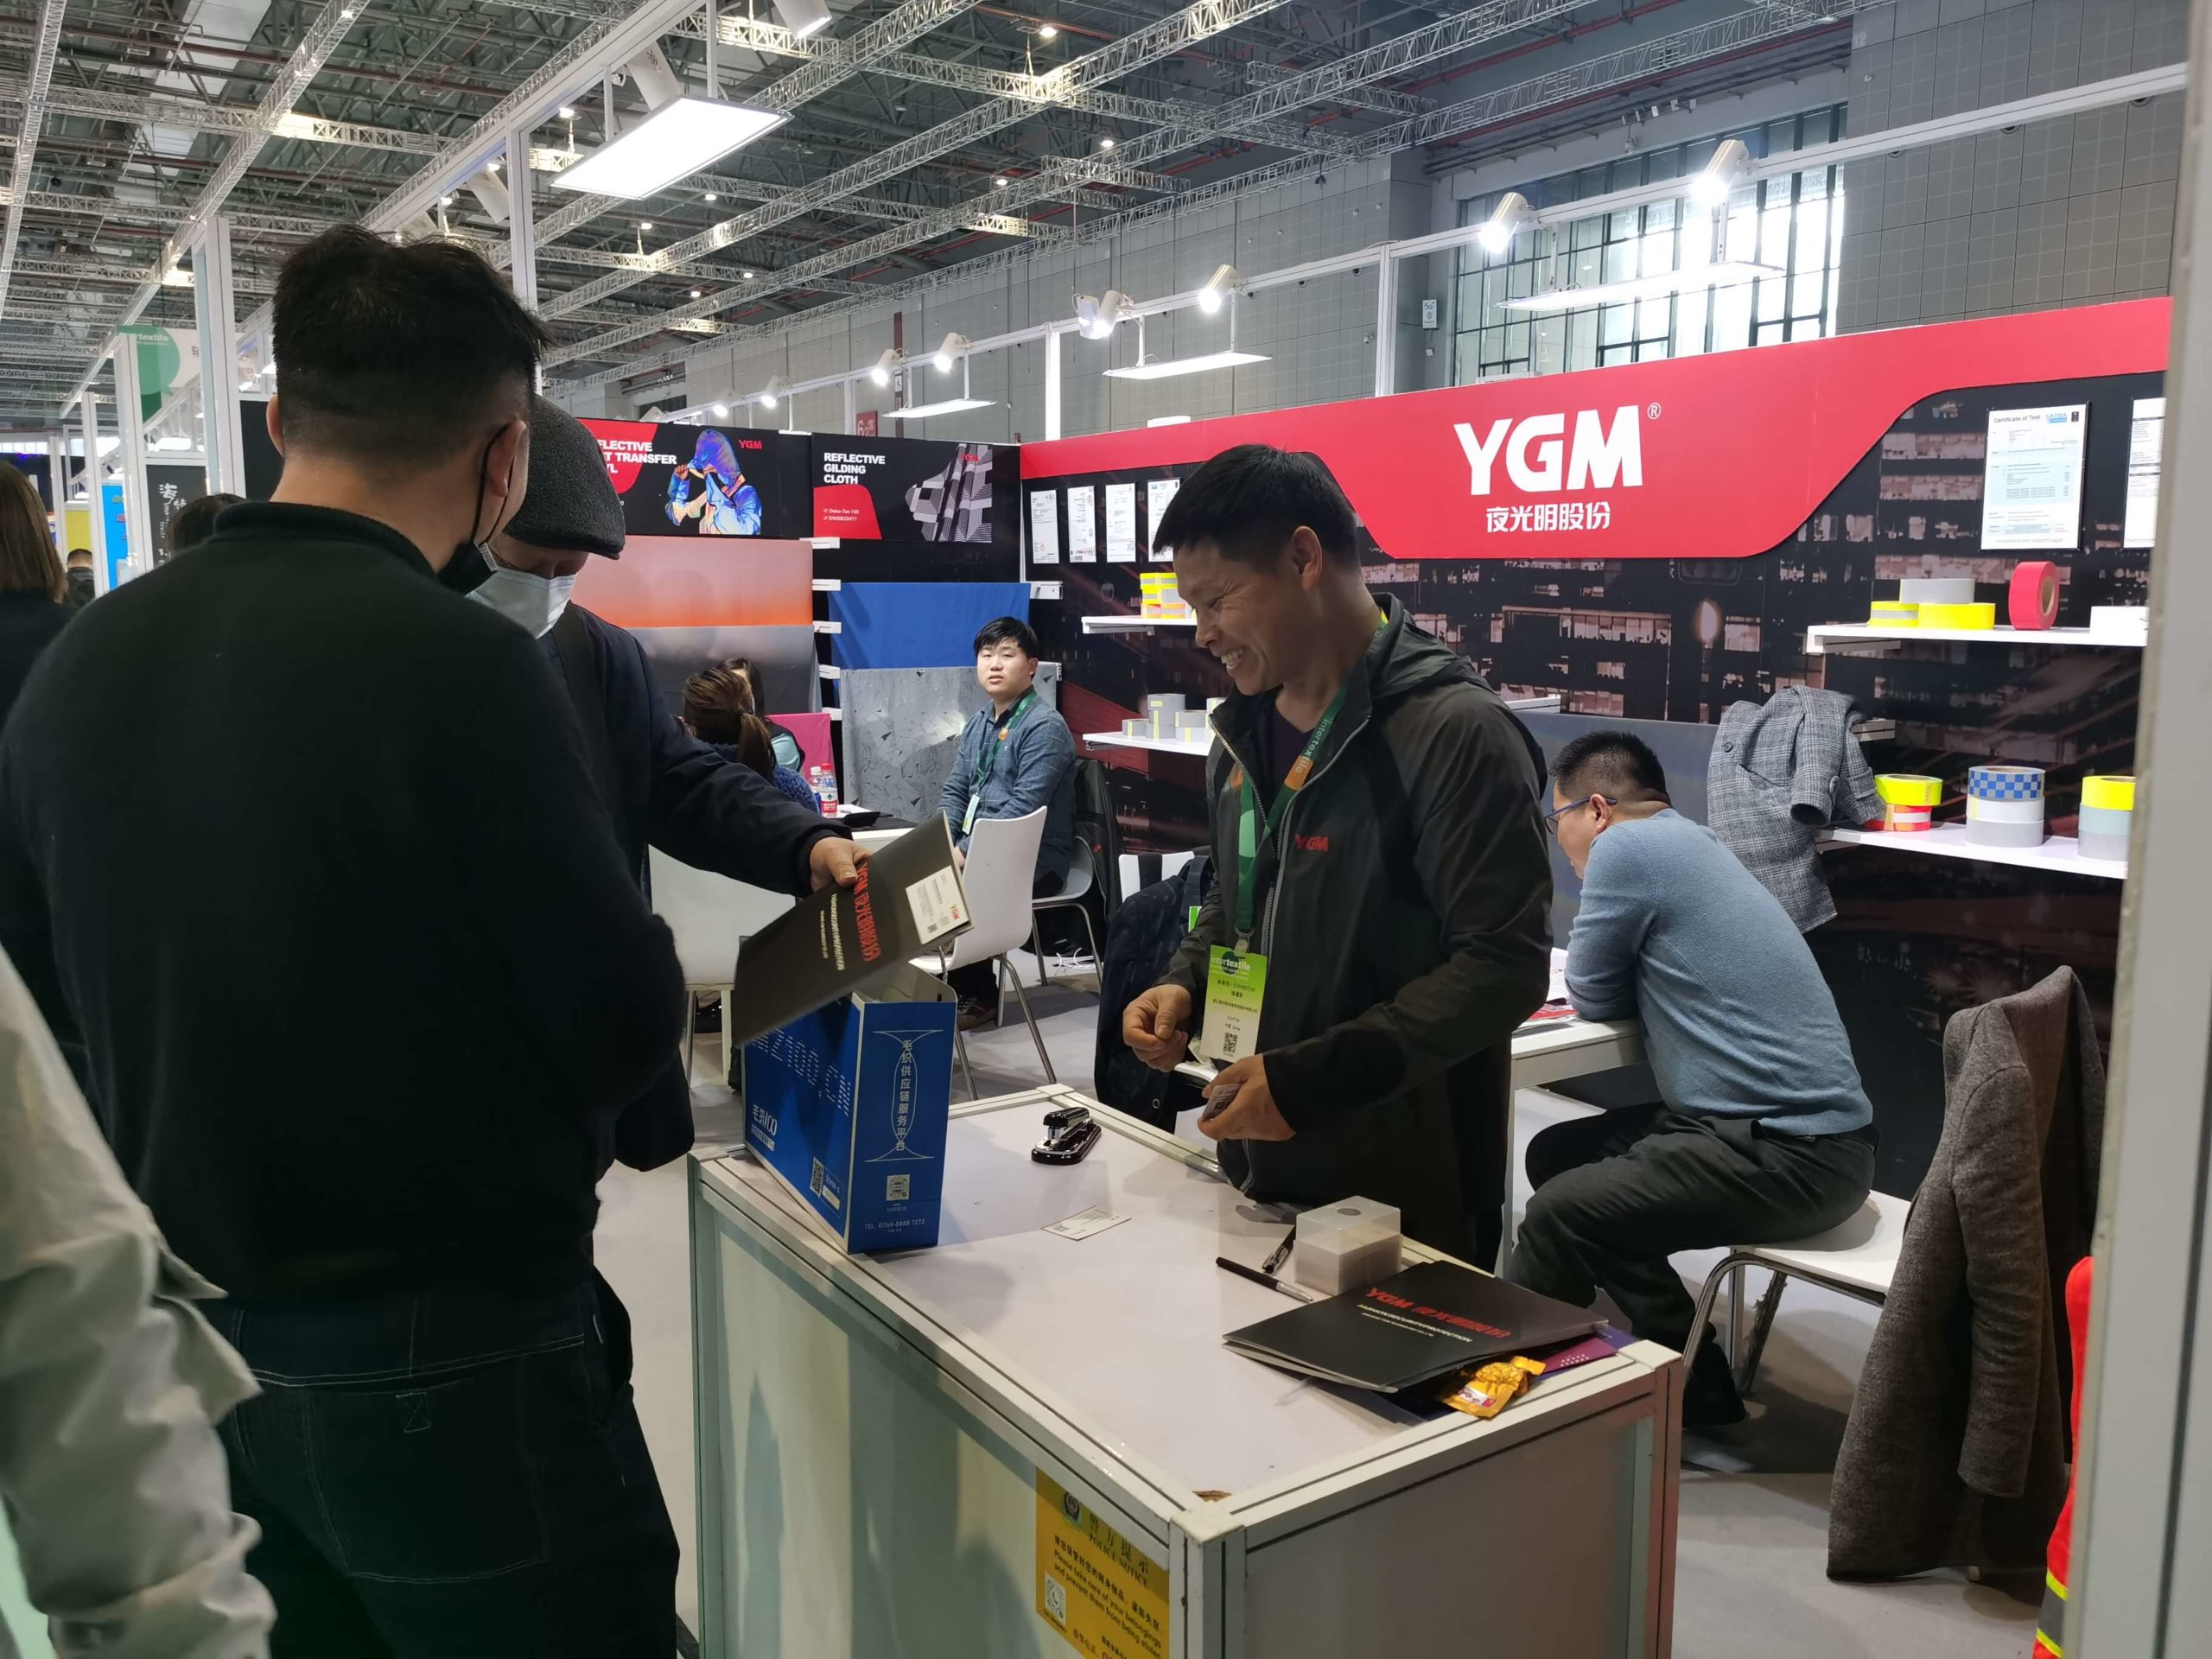 YGM reflective on intertextile2021 Trade Show (5)